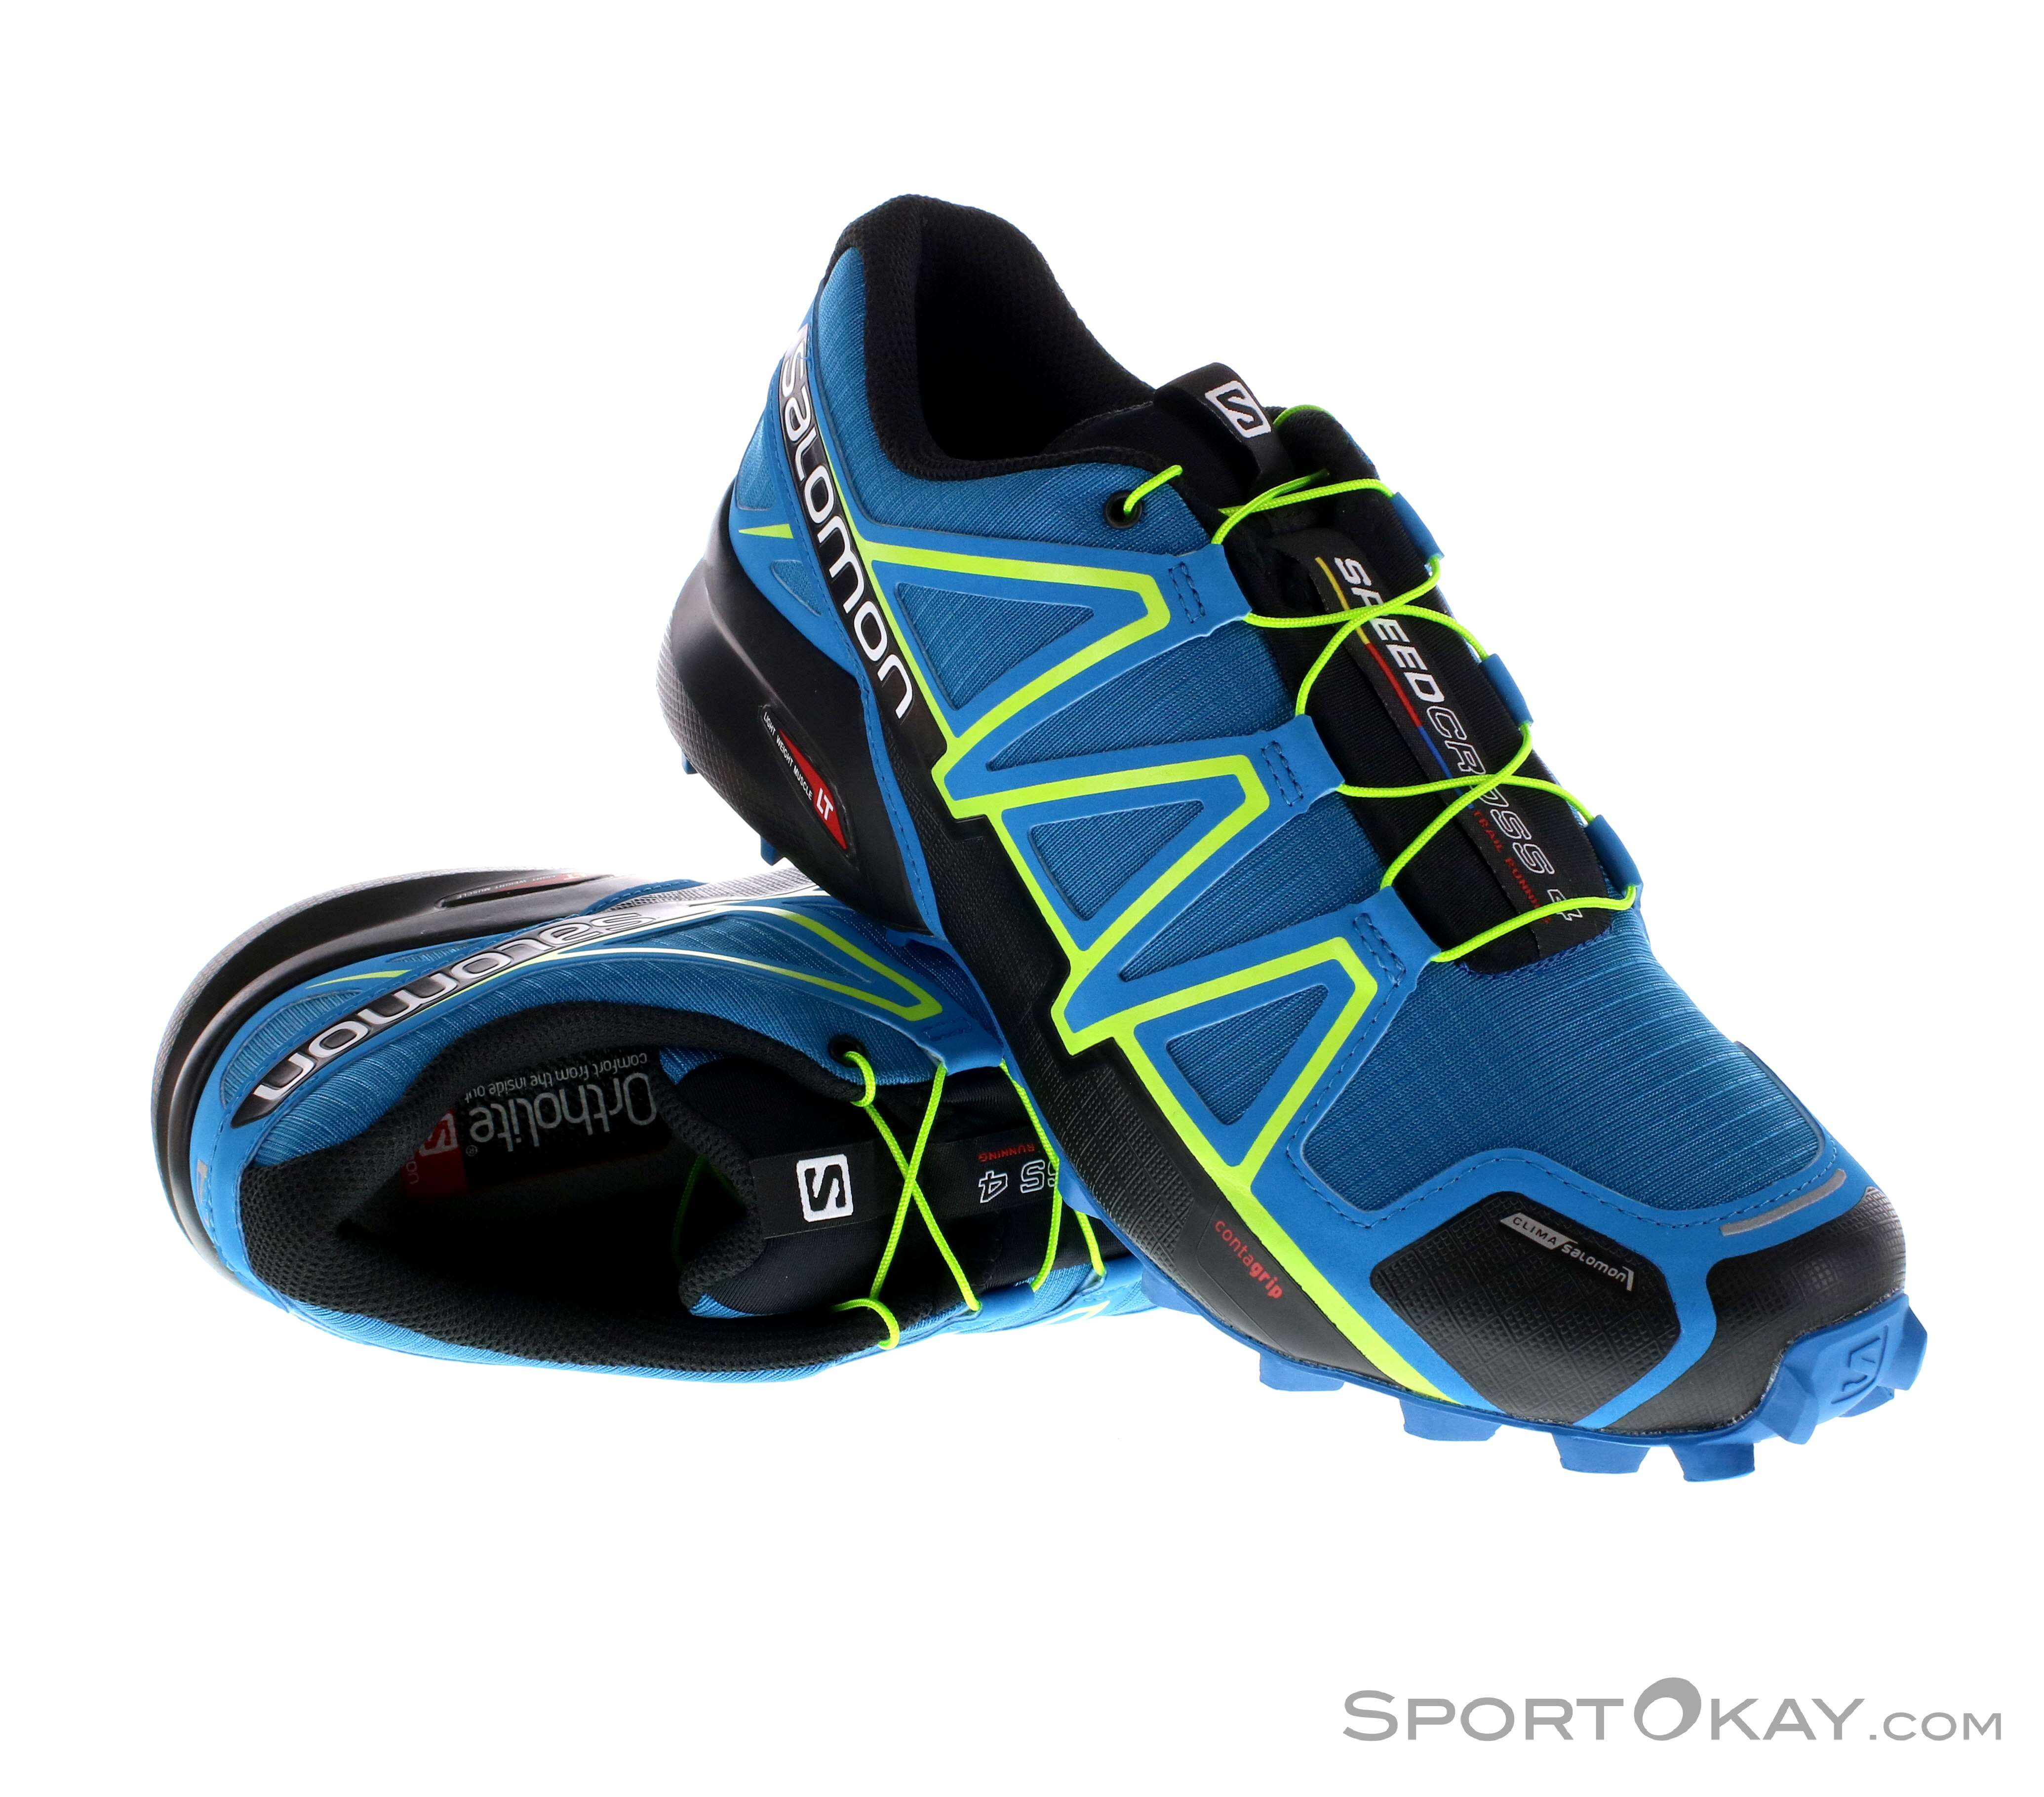 4040bb3e1 Salomon Speedcross 4 CS Mens Trail Running Shoes - Trail Running ...